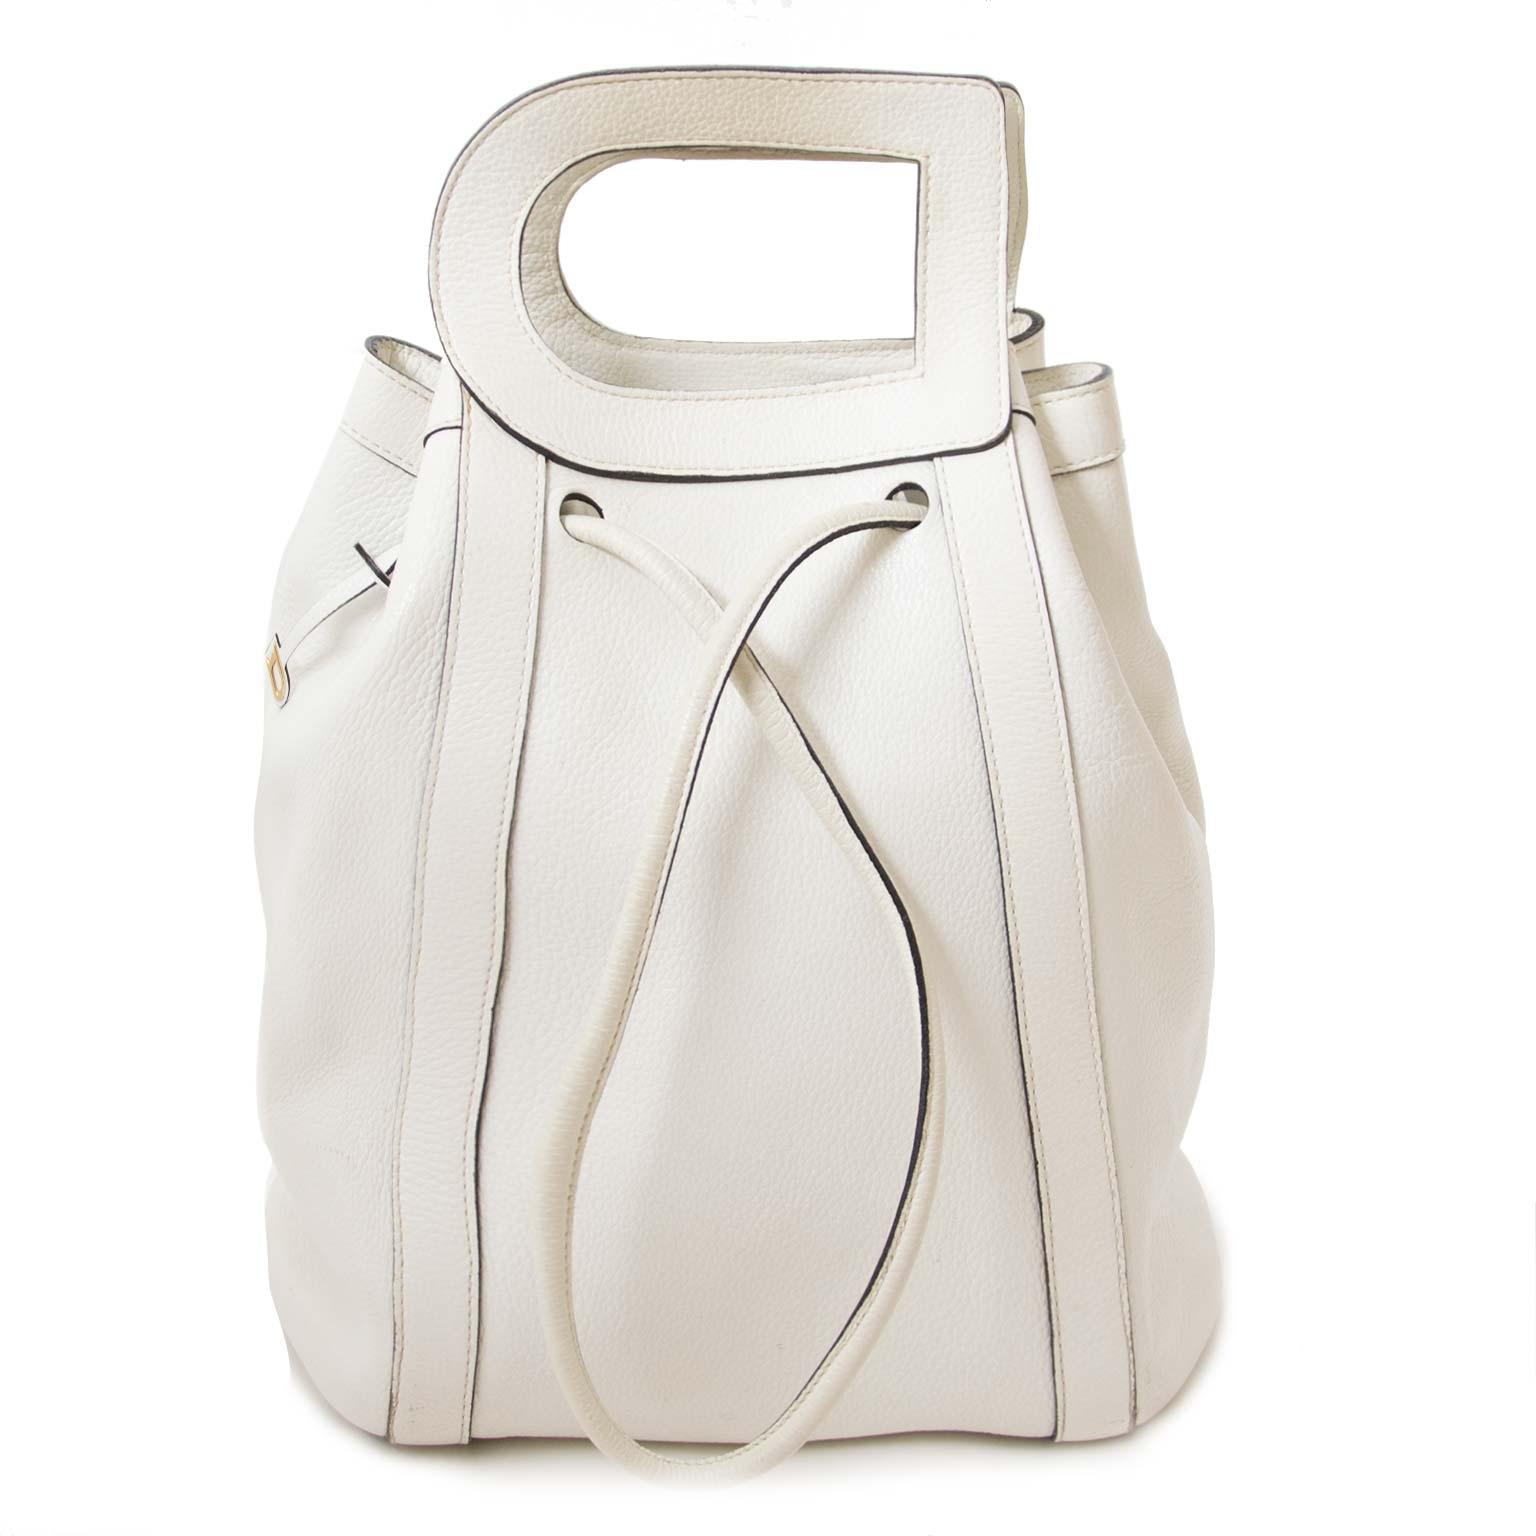 authentieke  Delvaux White Shoulderbag With 'D' Tophandle te koop bij labellov